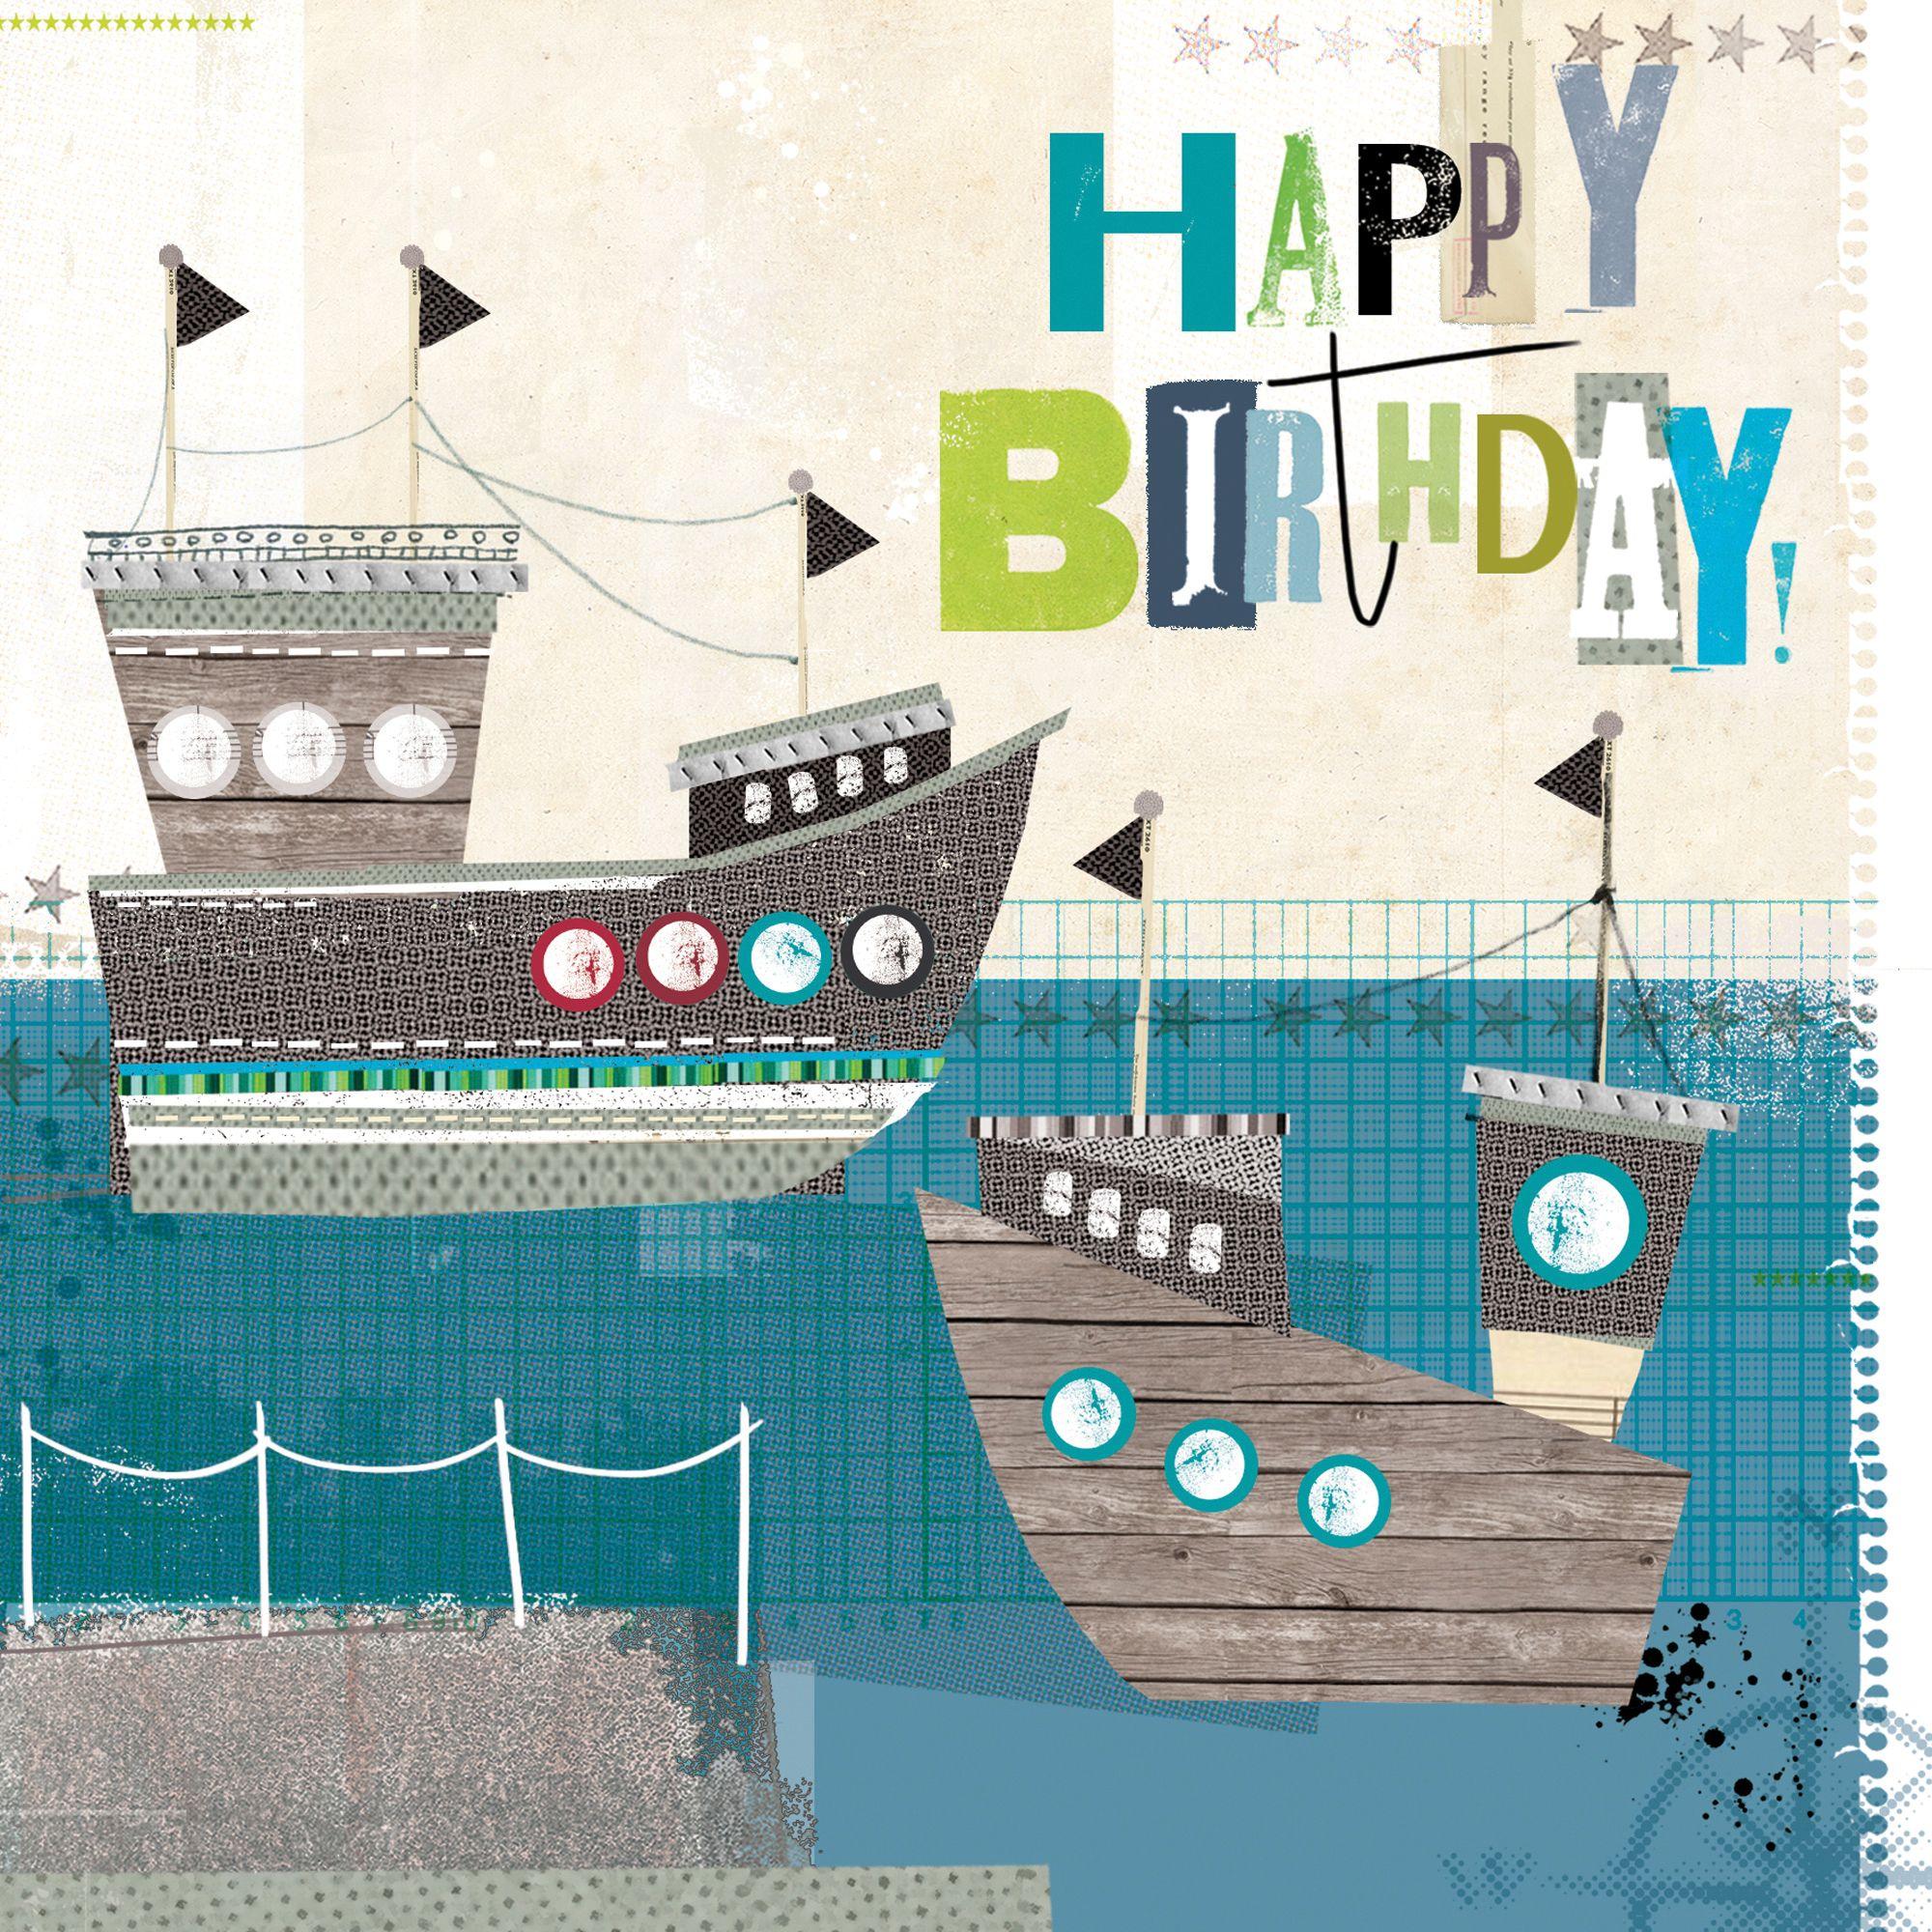 Birthday Sail W514 Birthday Greetings Card by Amy Tollafield